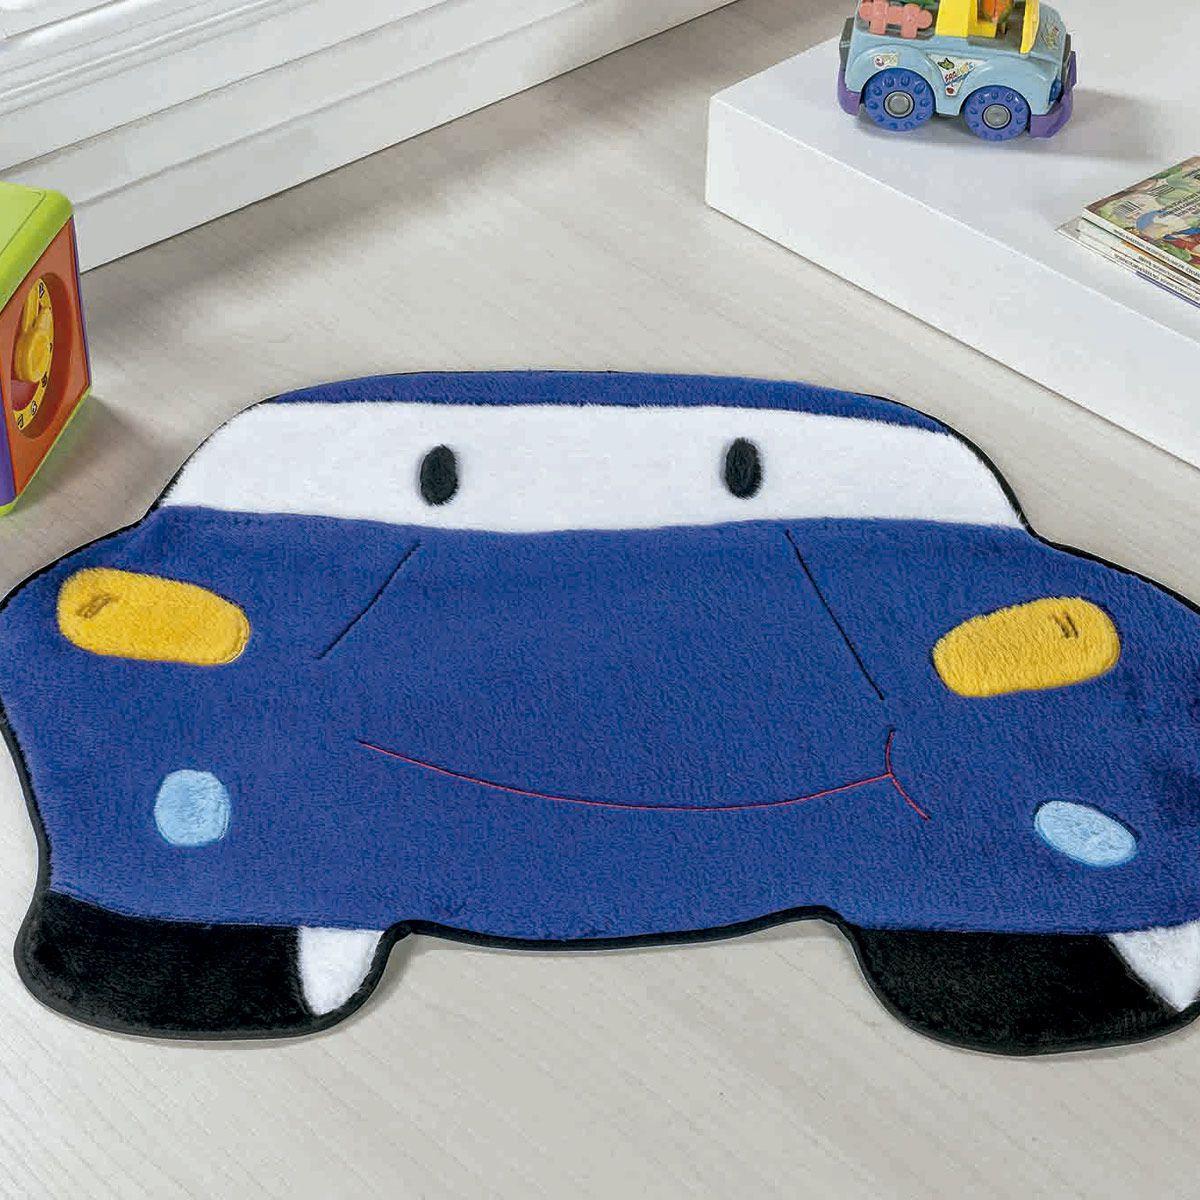 Tapete Infantil Premium Formato Carro Azul Royal 78cm x 60cm